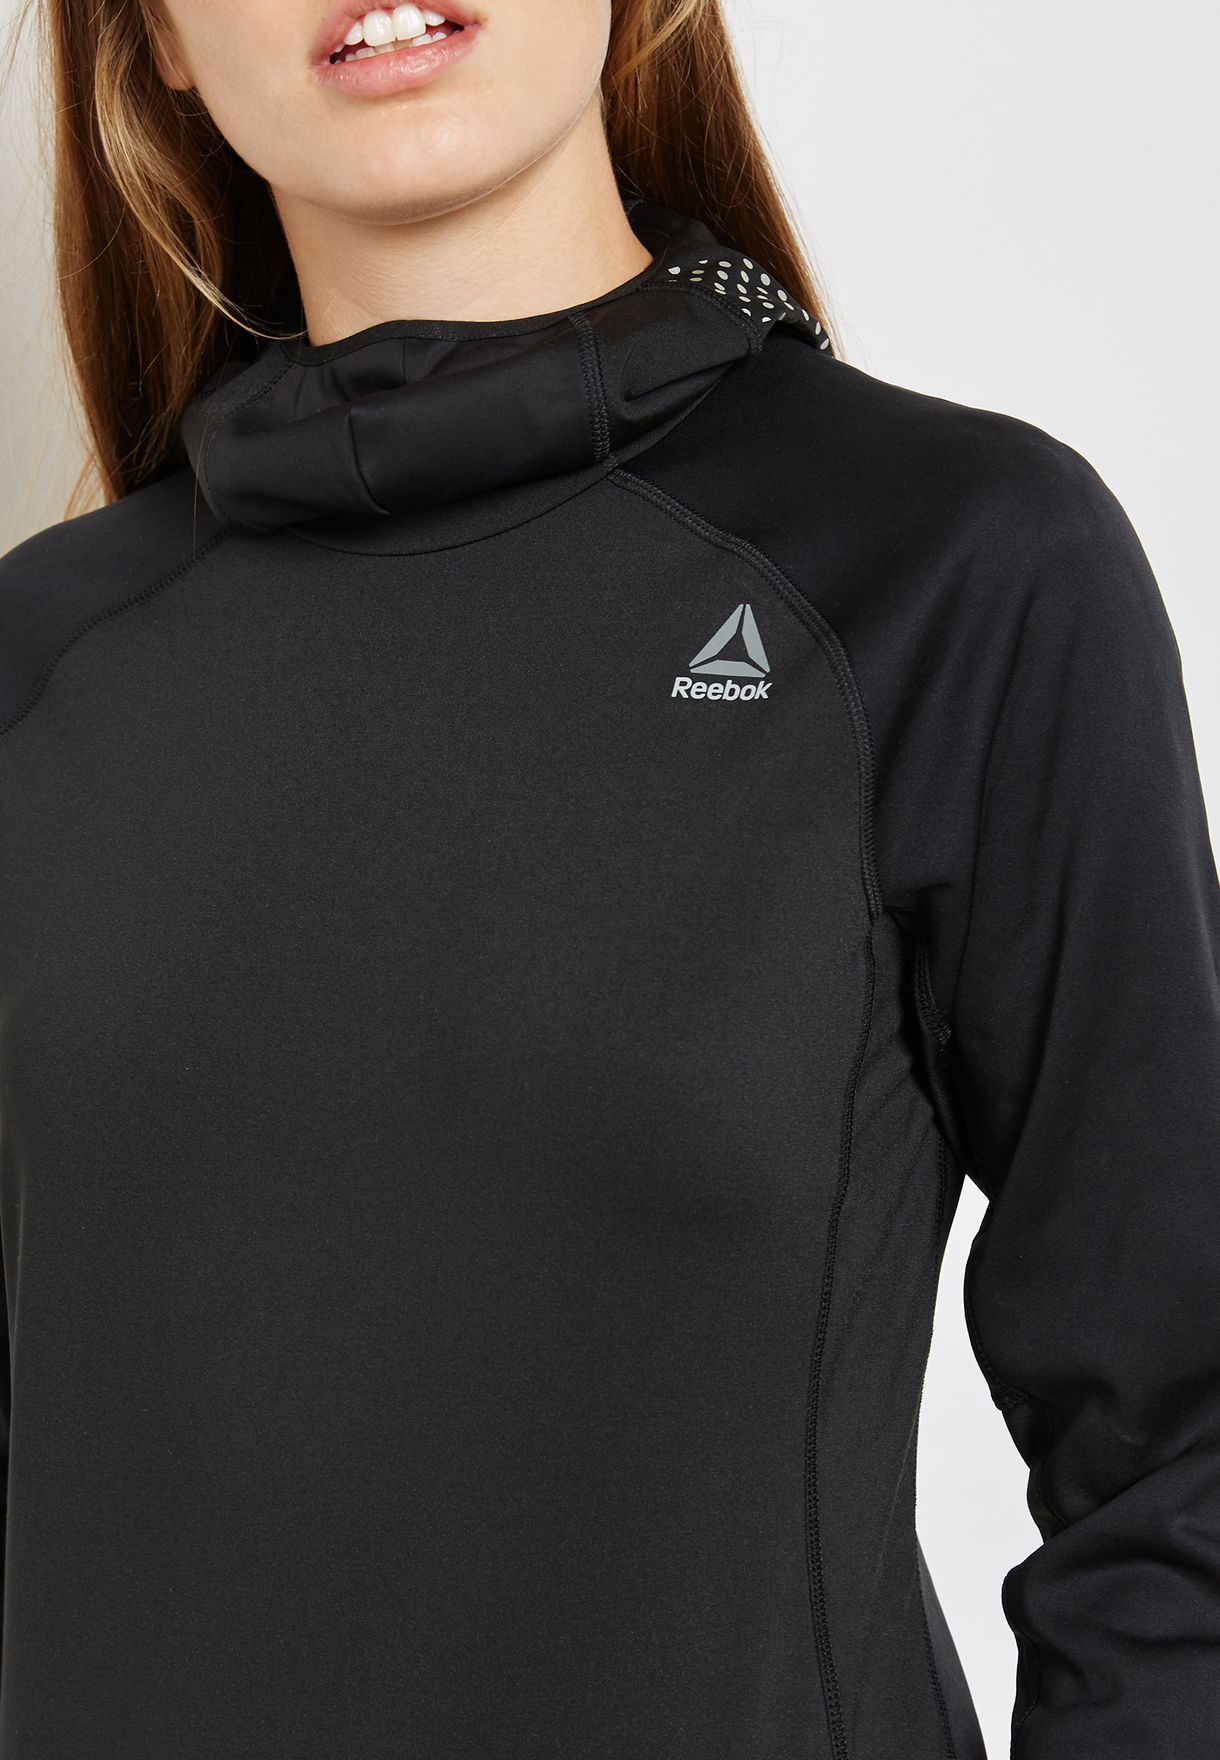 Reebok Hexawarm Reflective Scuba Hoodie Sweatshirts